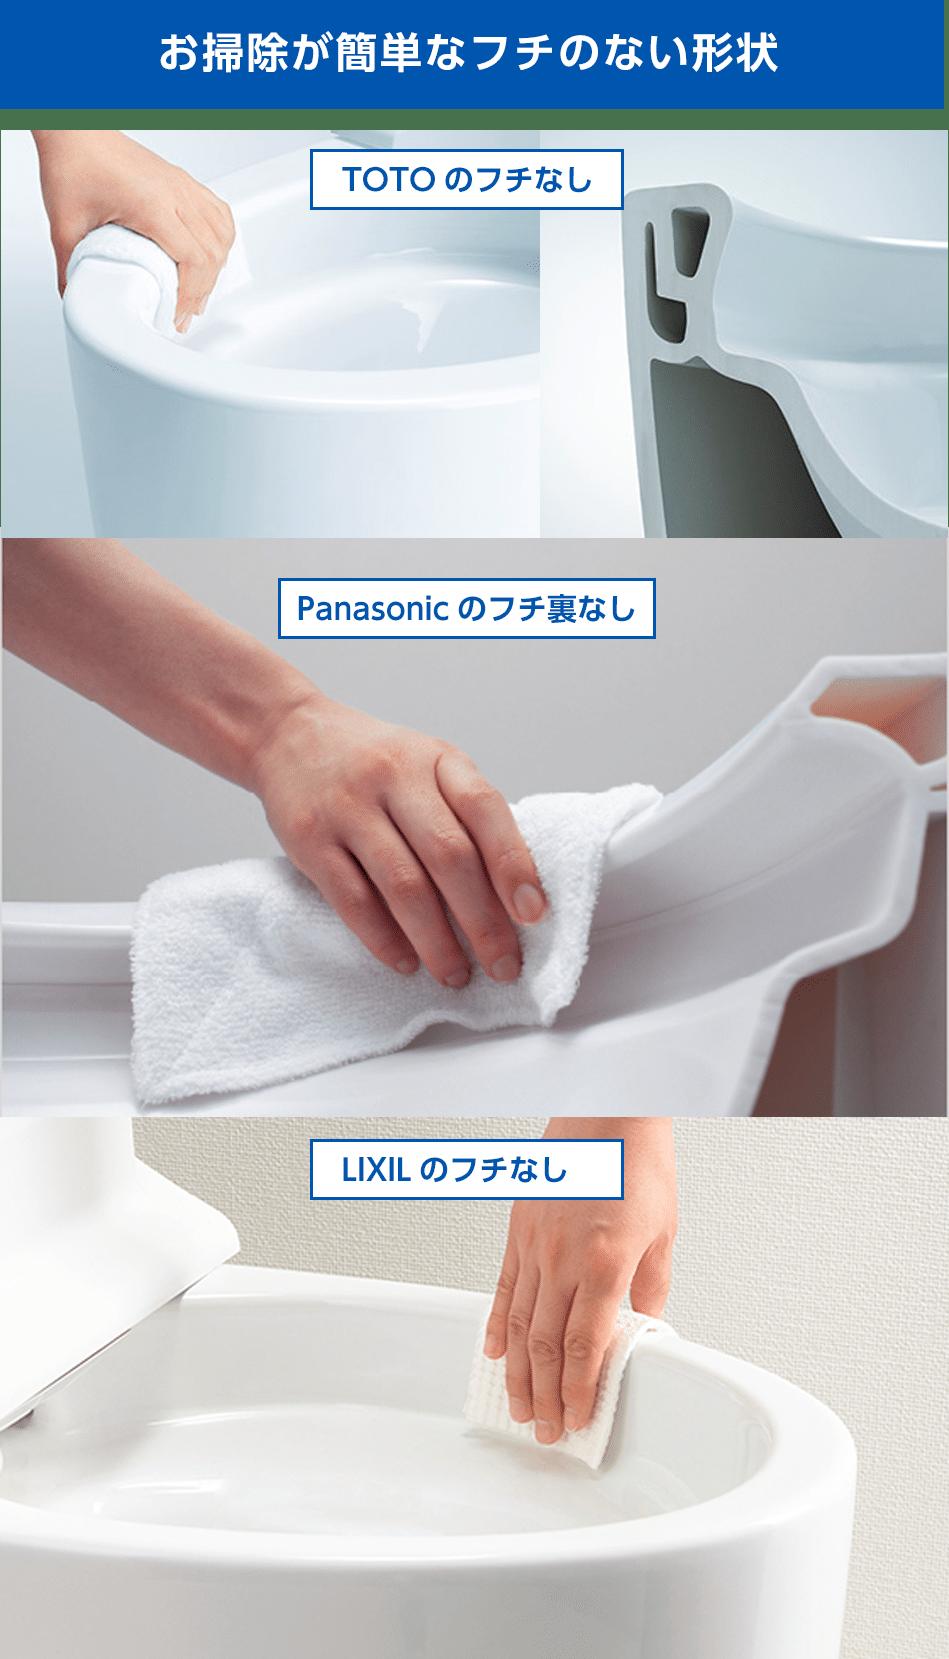 TOTO・LIXIL・Panasonicなどトイレの主流メーカーでフチのない形状の便器を選ぶことができます。